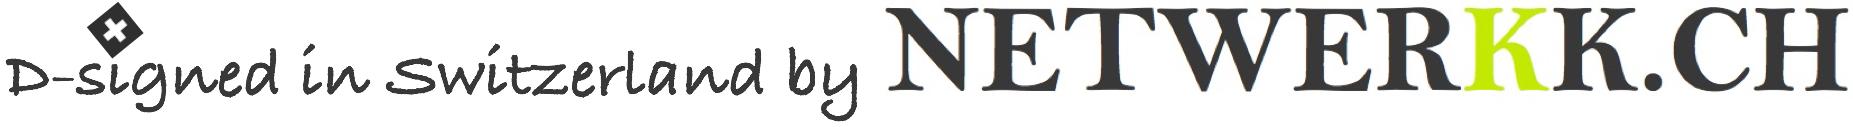 Logo Netwerkk.ch